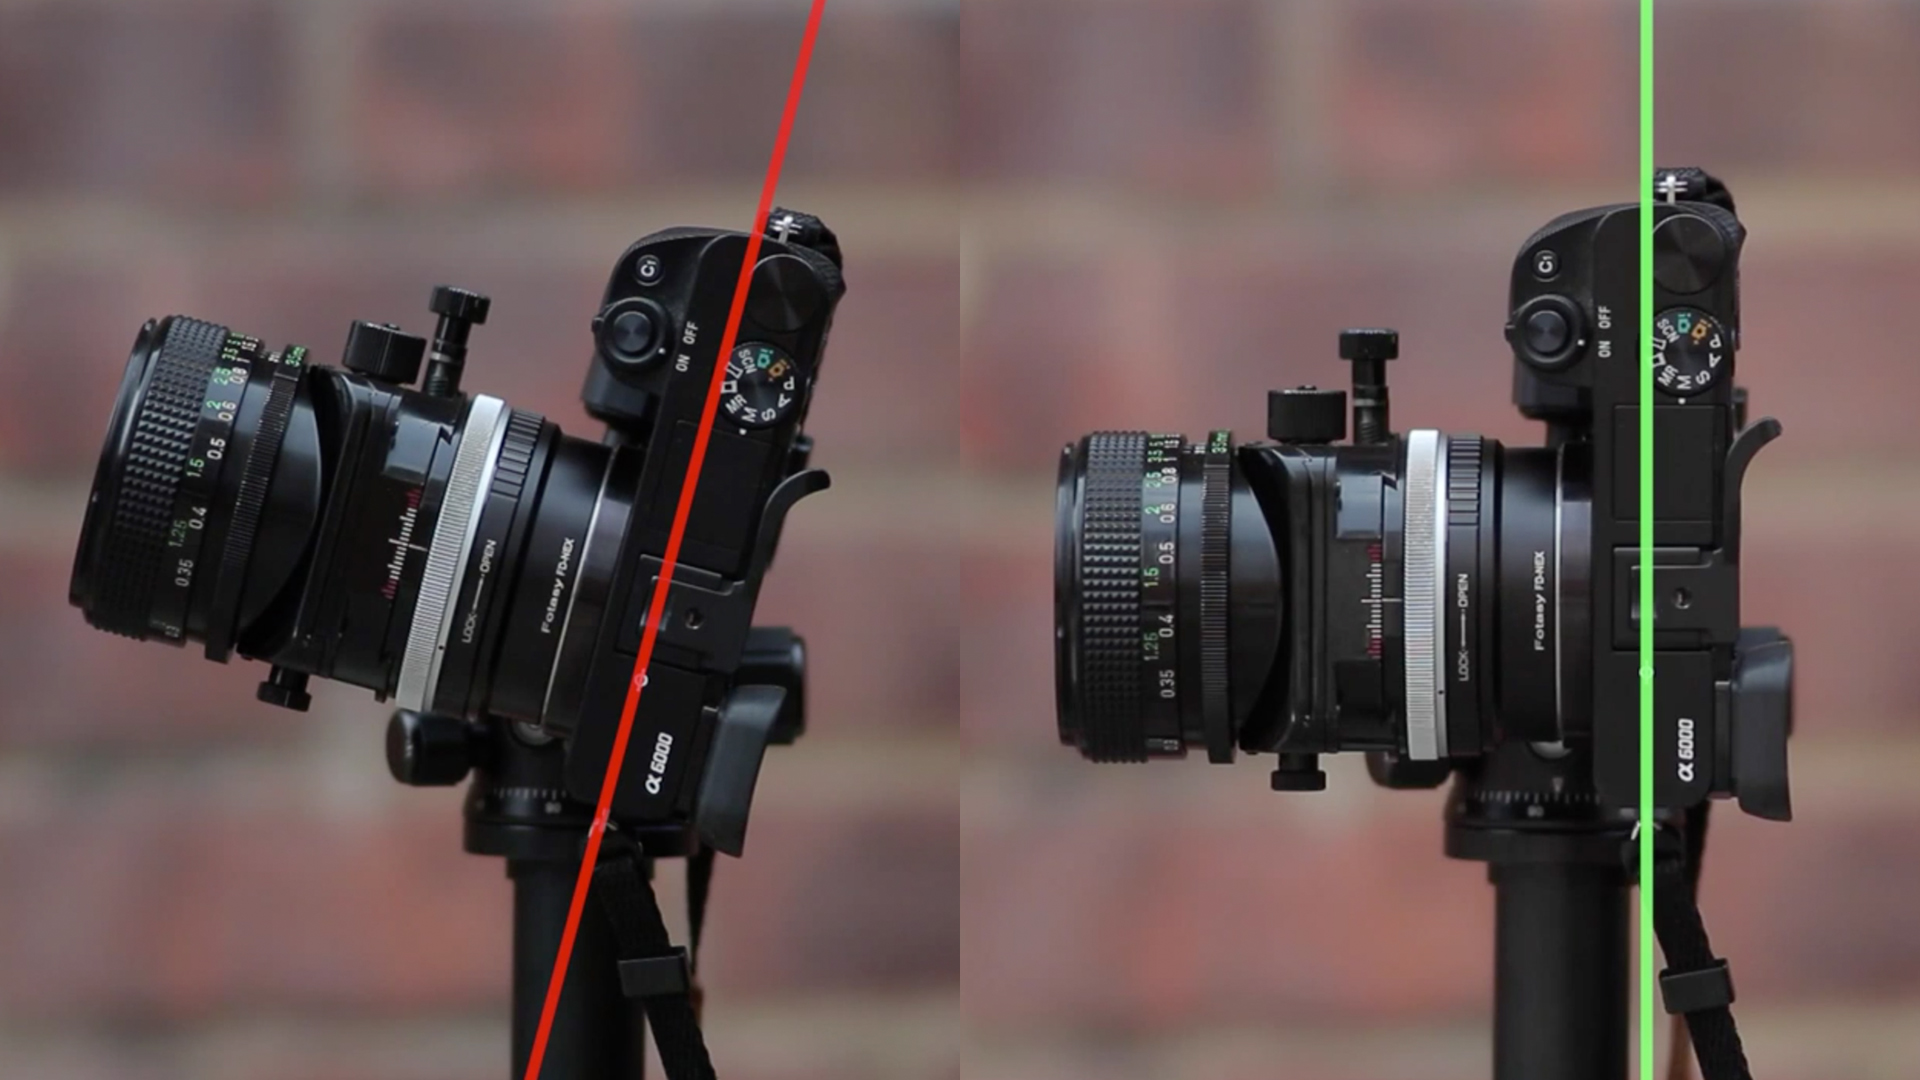 Shifting Gears How To Shoot Real Tilt Shift Photography Cameraville Diagram Of A Dslr Camera Digital Block Correcting Converging Verticals Cameraplex